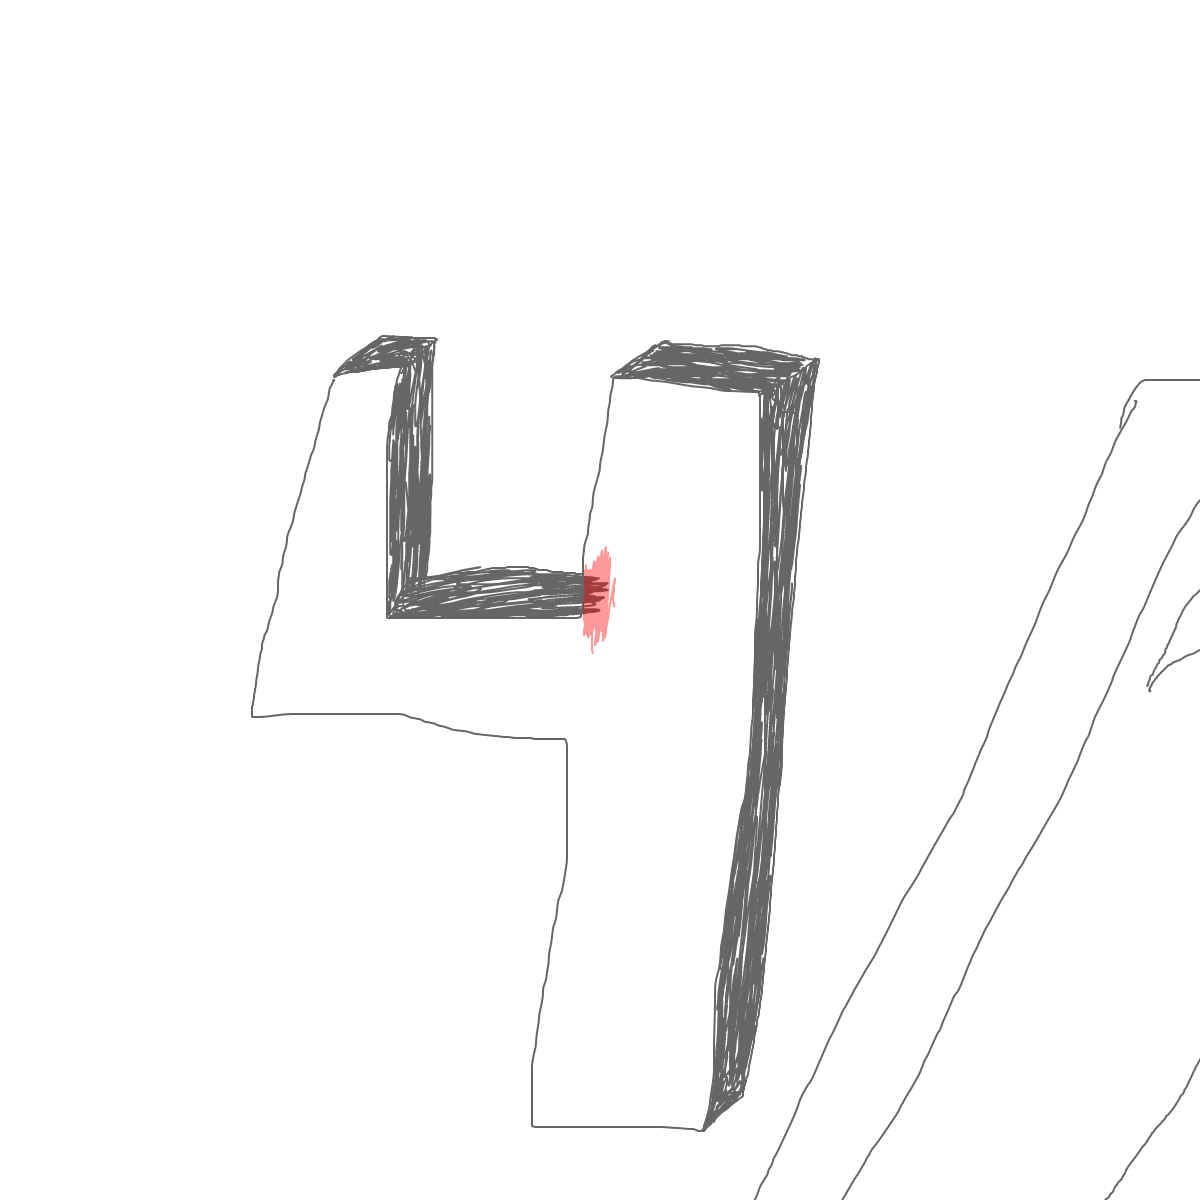 BAAAM drawing#9703 lat:52.4751167297363300lng: 13.4065256118774410